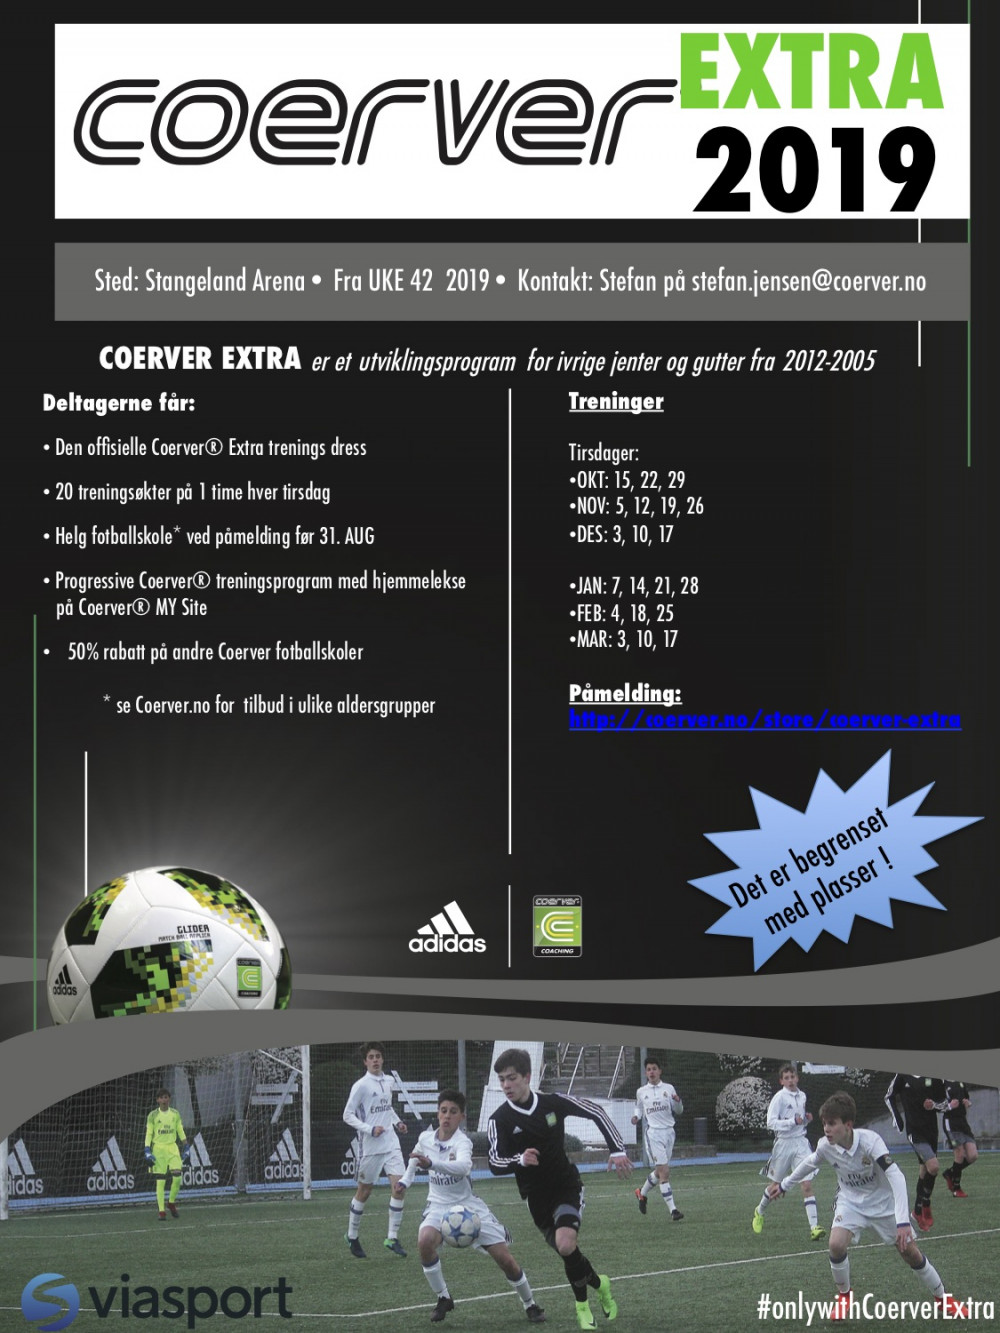 Coerver Extra på Stangeland Arena (Stavanger) 2019/20